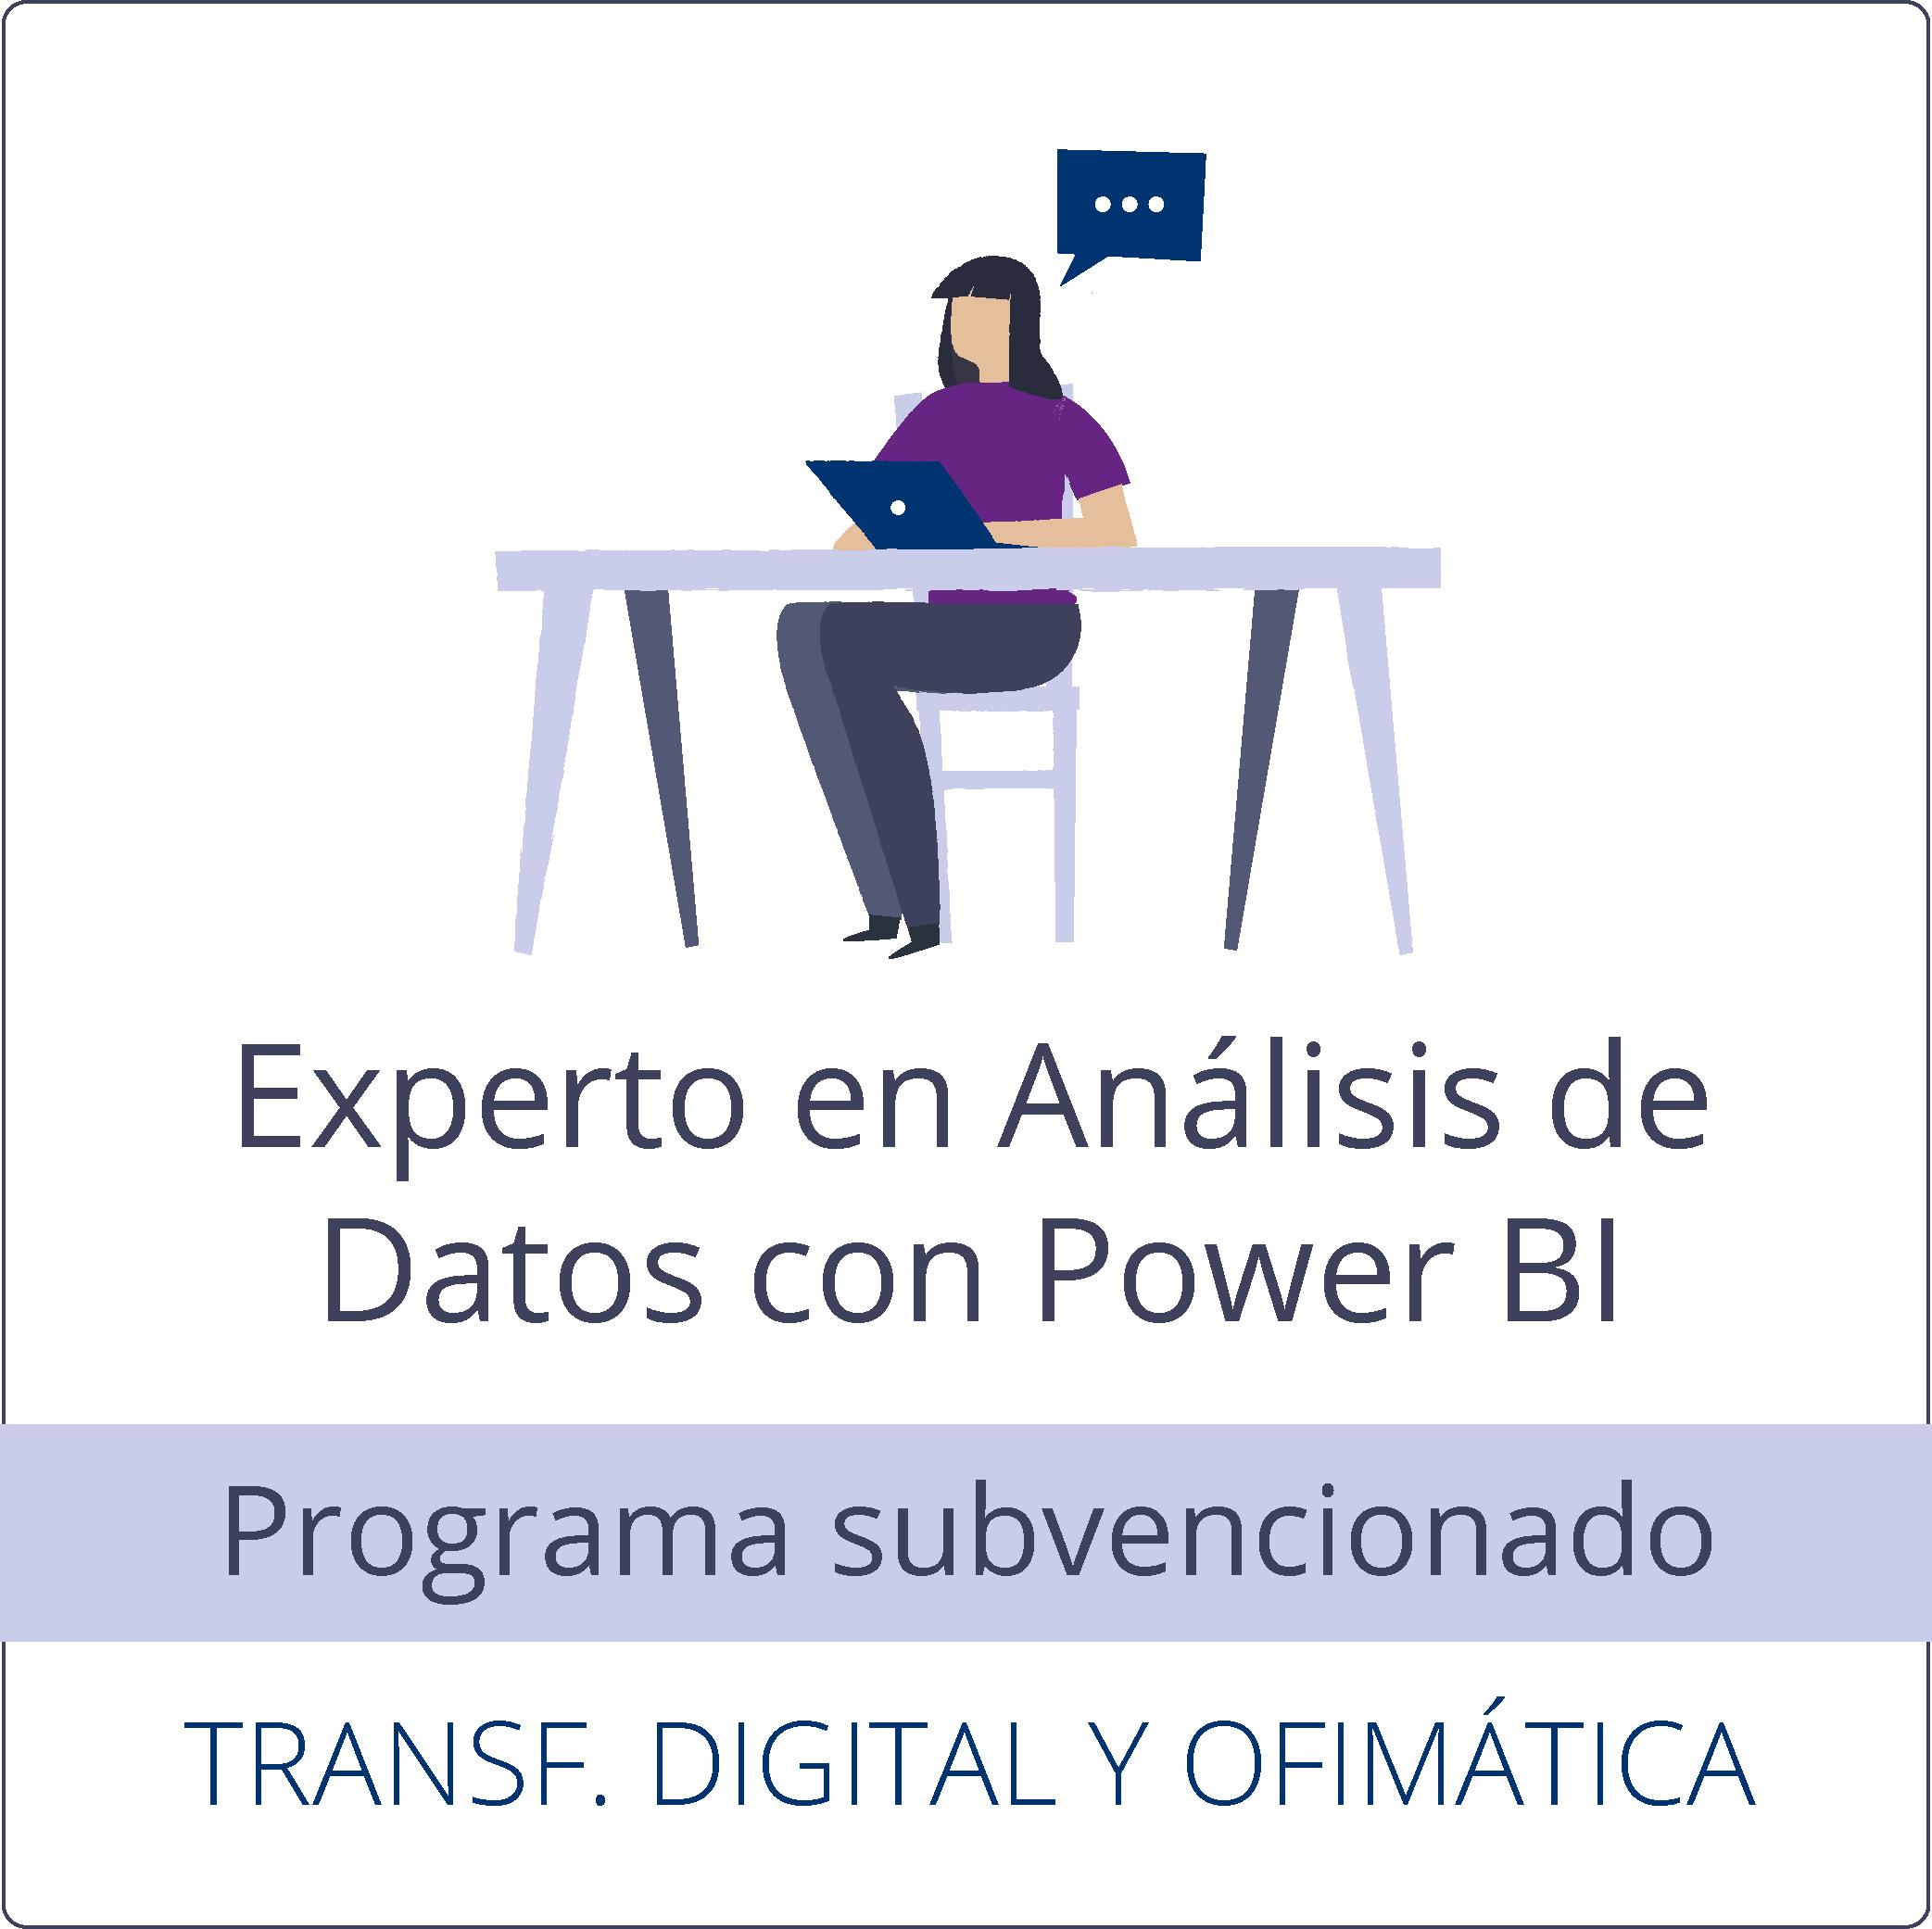 Experto en Análisis de Datos con Power BI (gratuito)